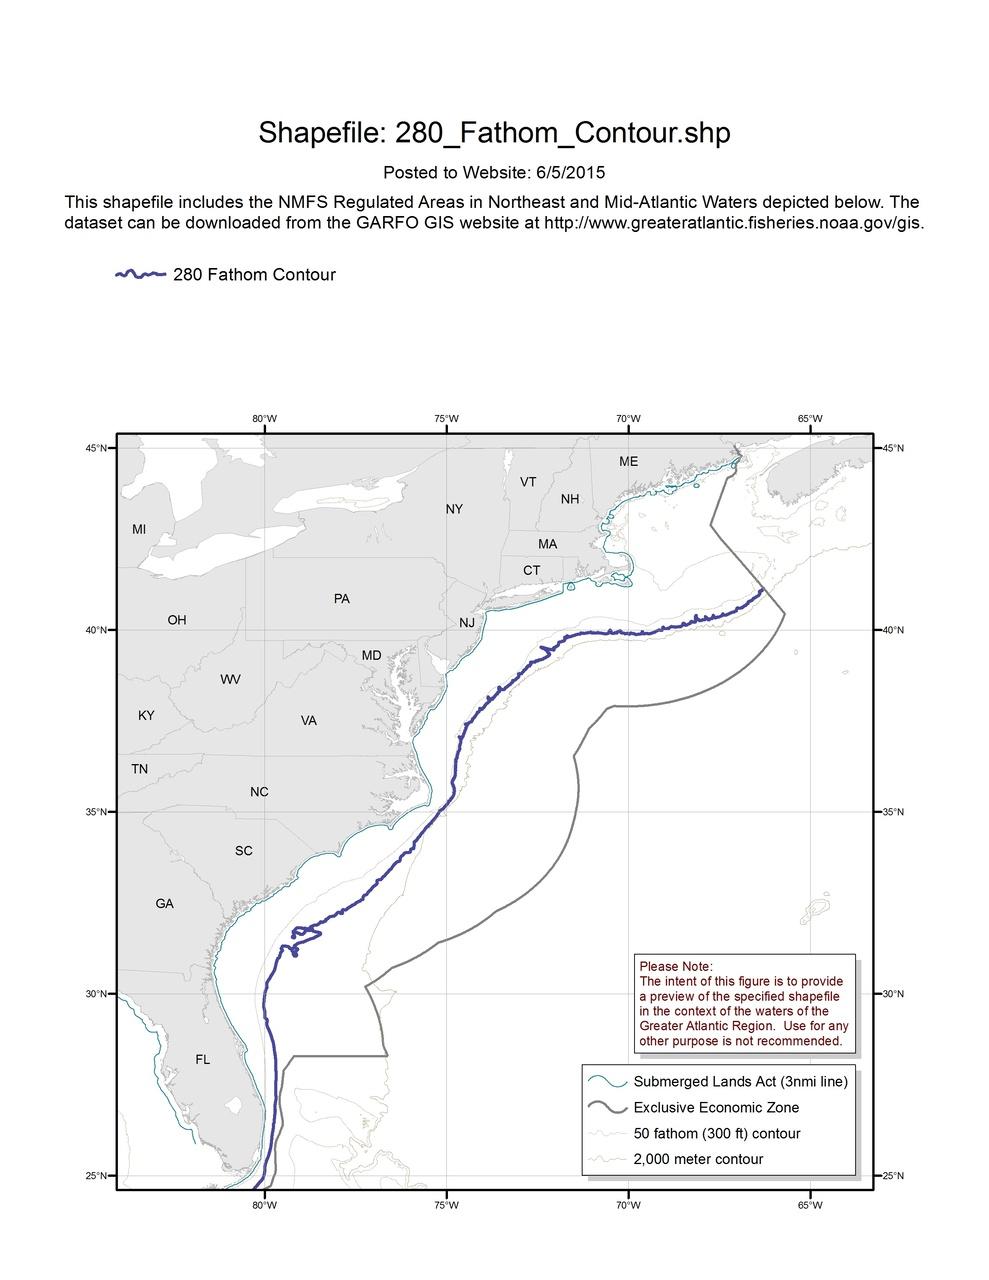 280-Fathom-Contour-MAP-NOAA-GARFO.jpg